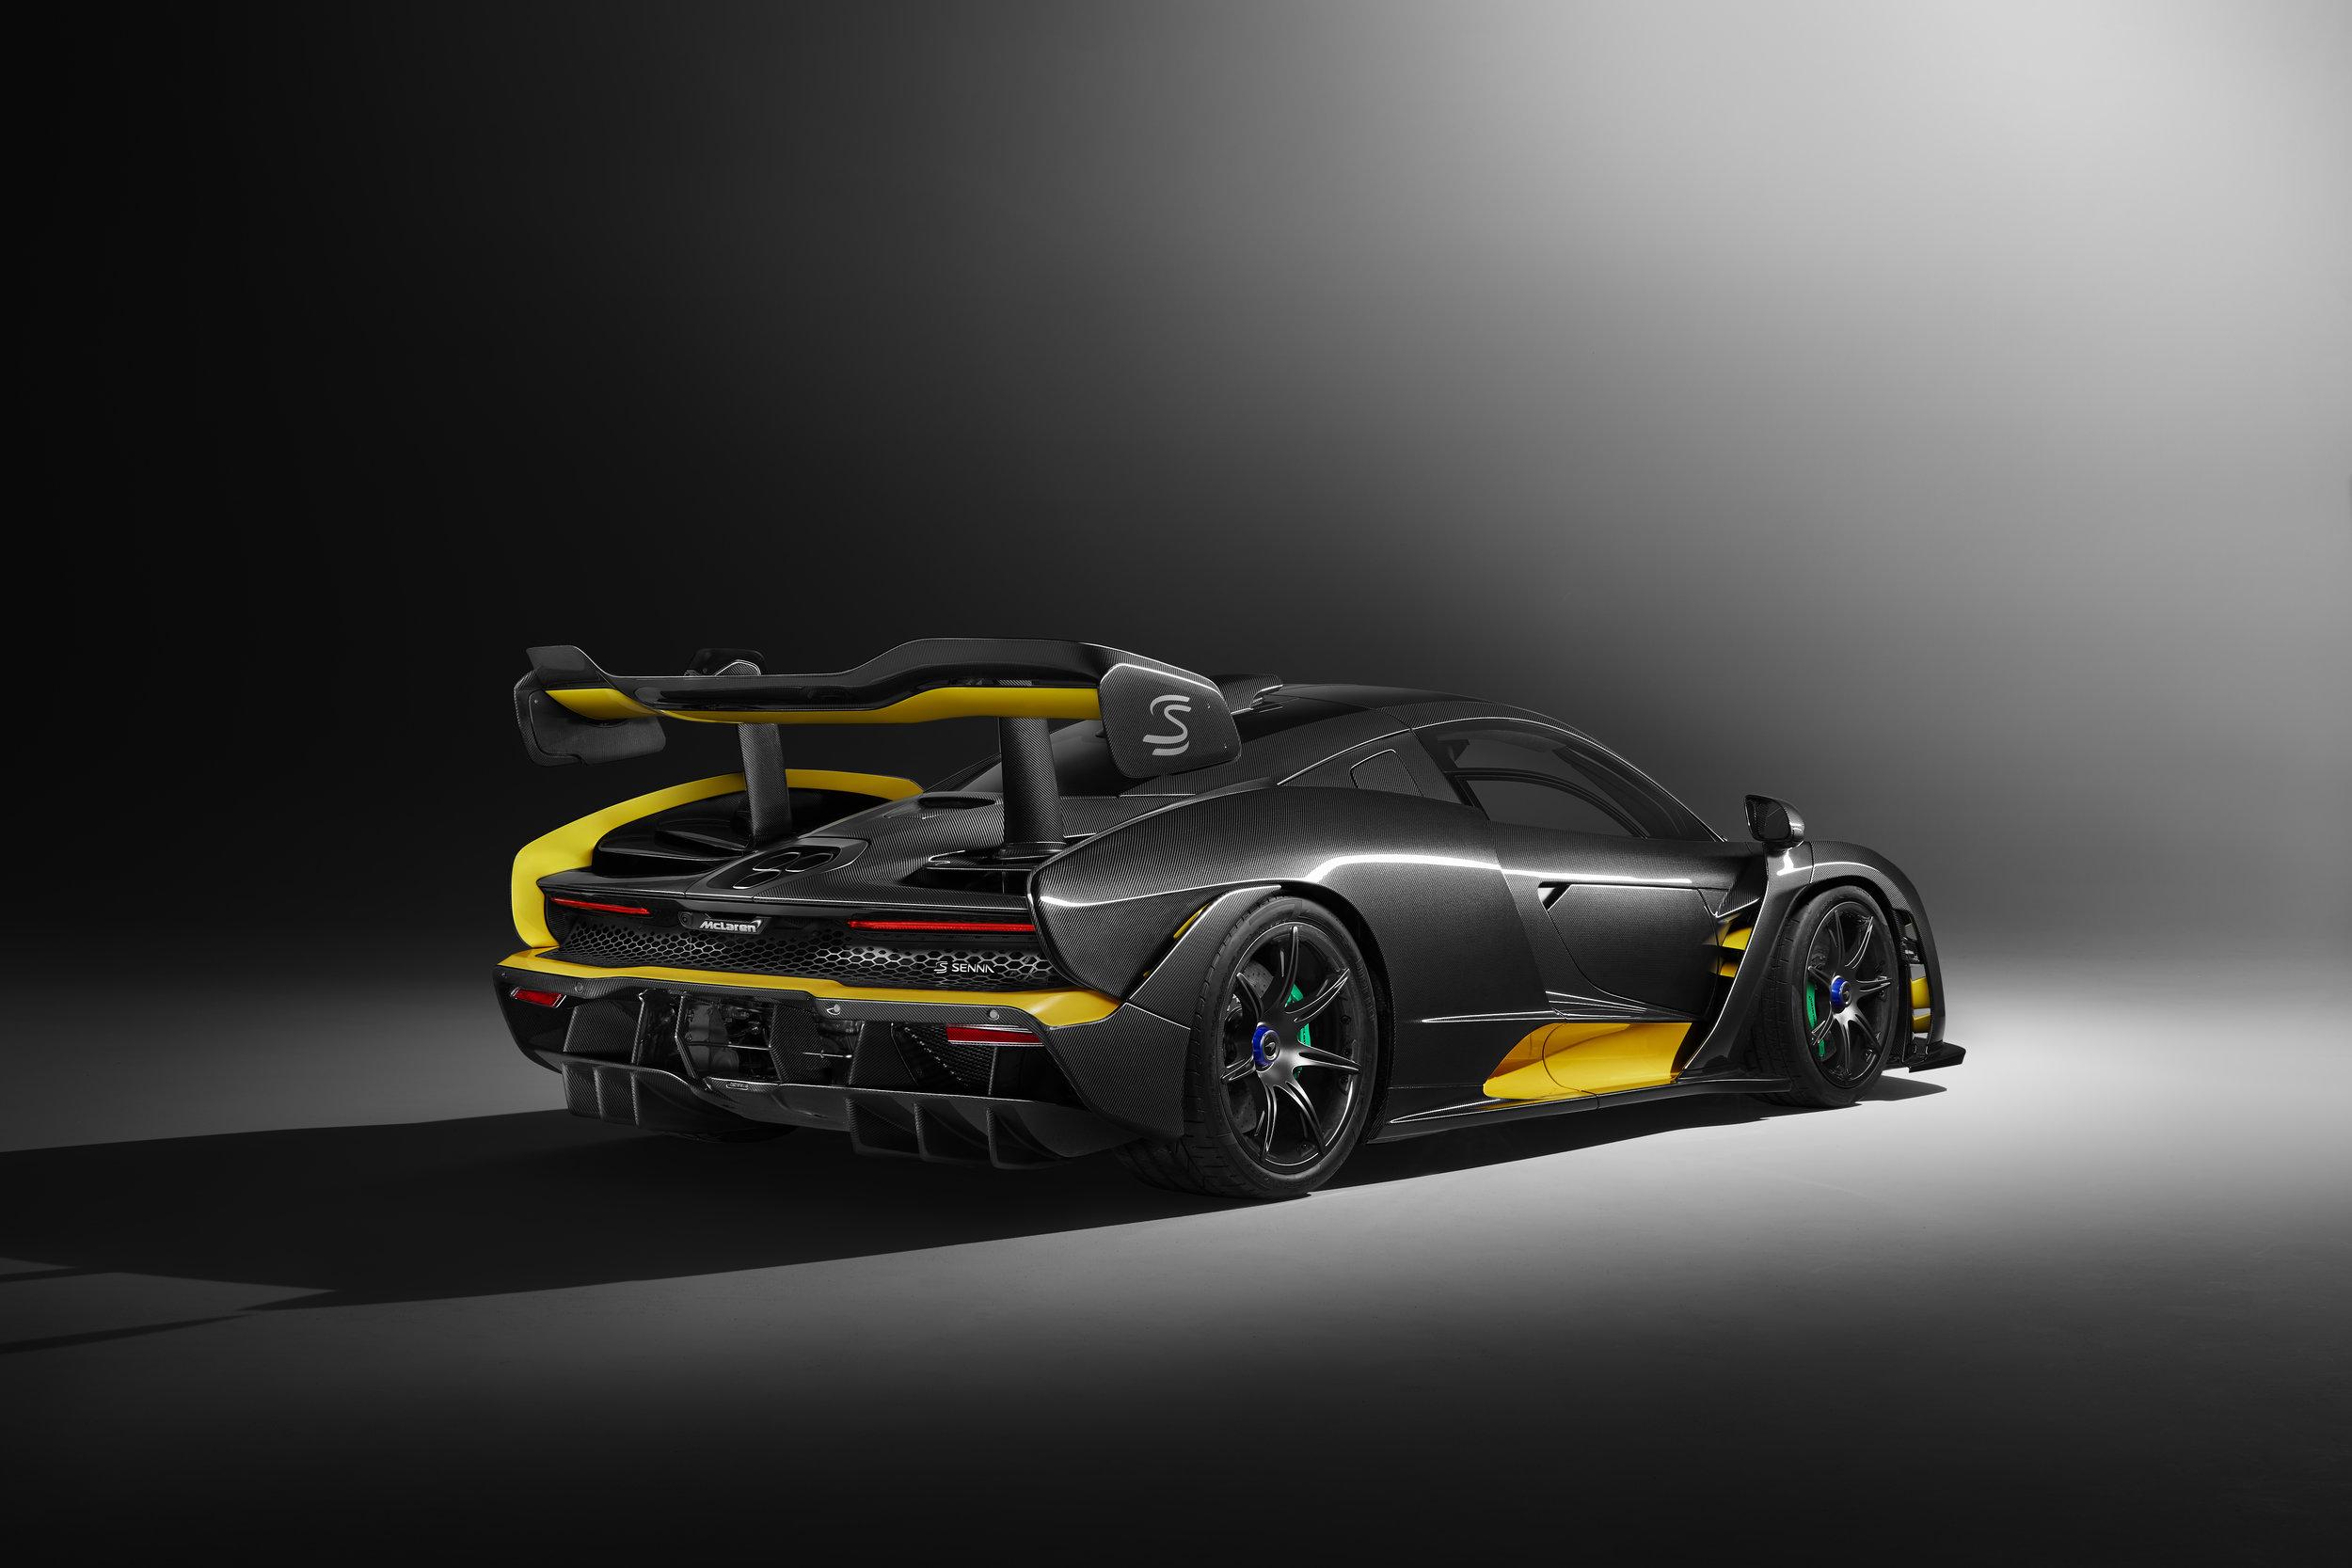 8952McLaren-Senna-Carbon-Theme-by-MSO_02.jpg